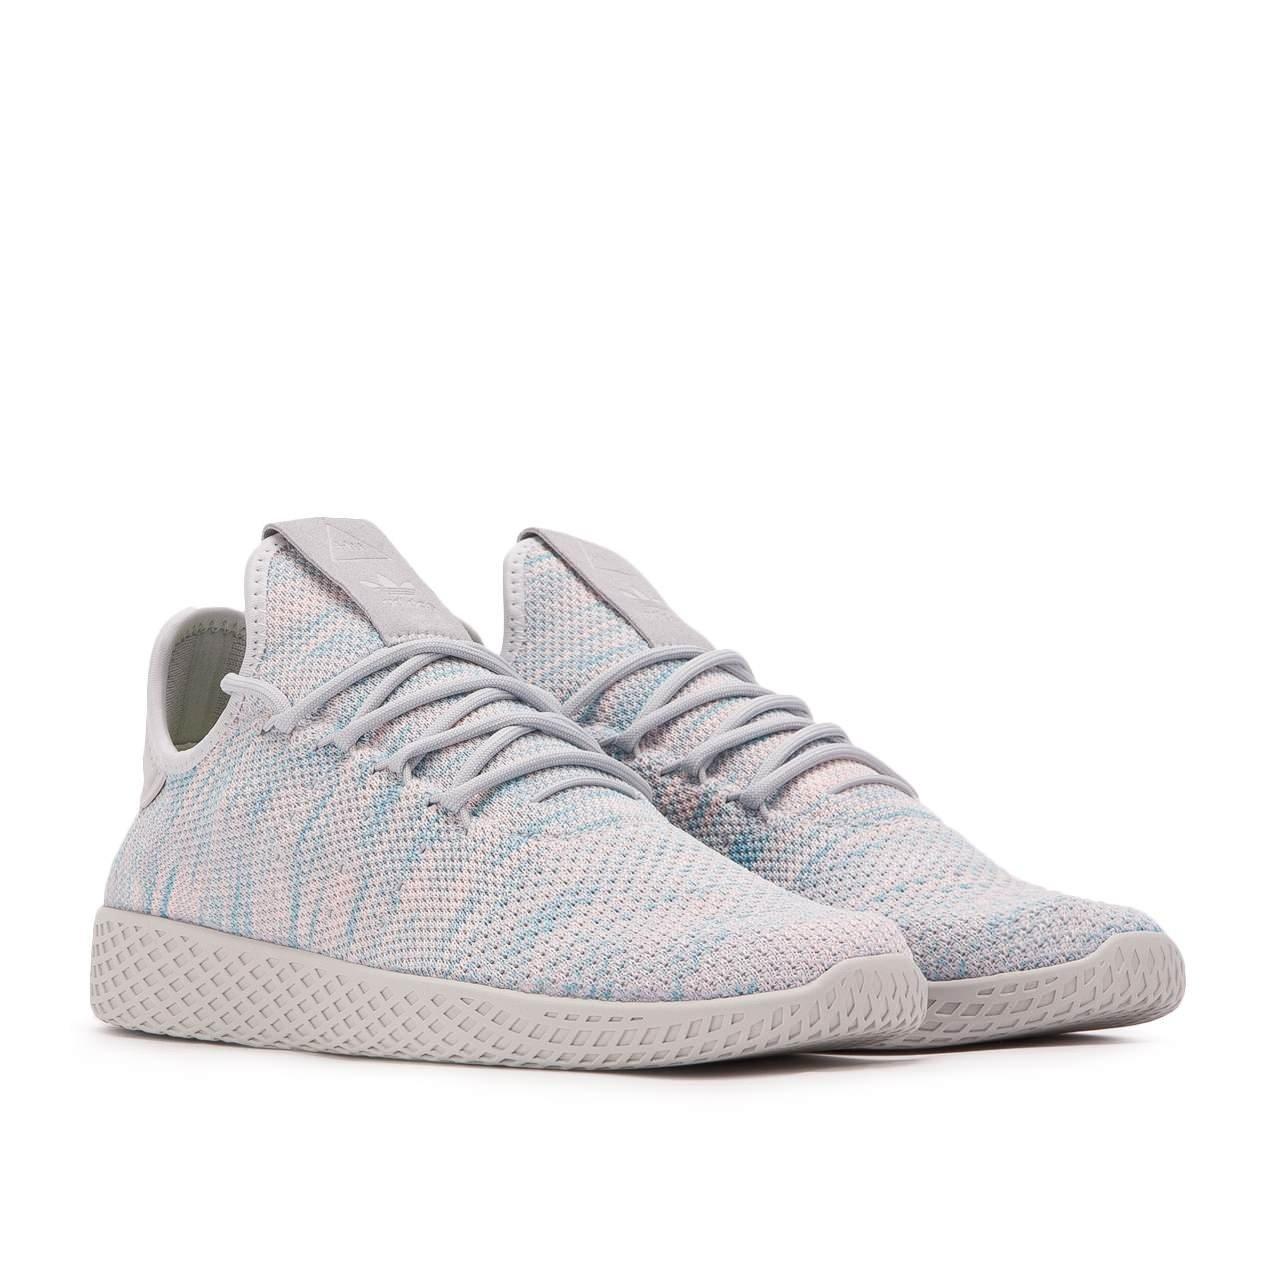 06eddb8a9 adidas PW Tennis HU - BY2671  Amazon.co.uk  Shoes   Bags